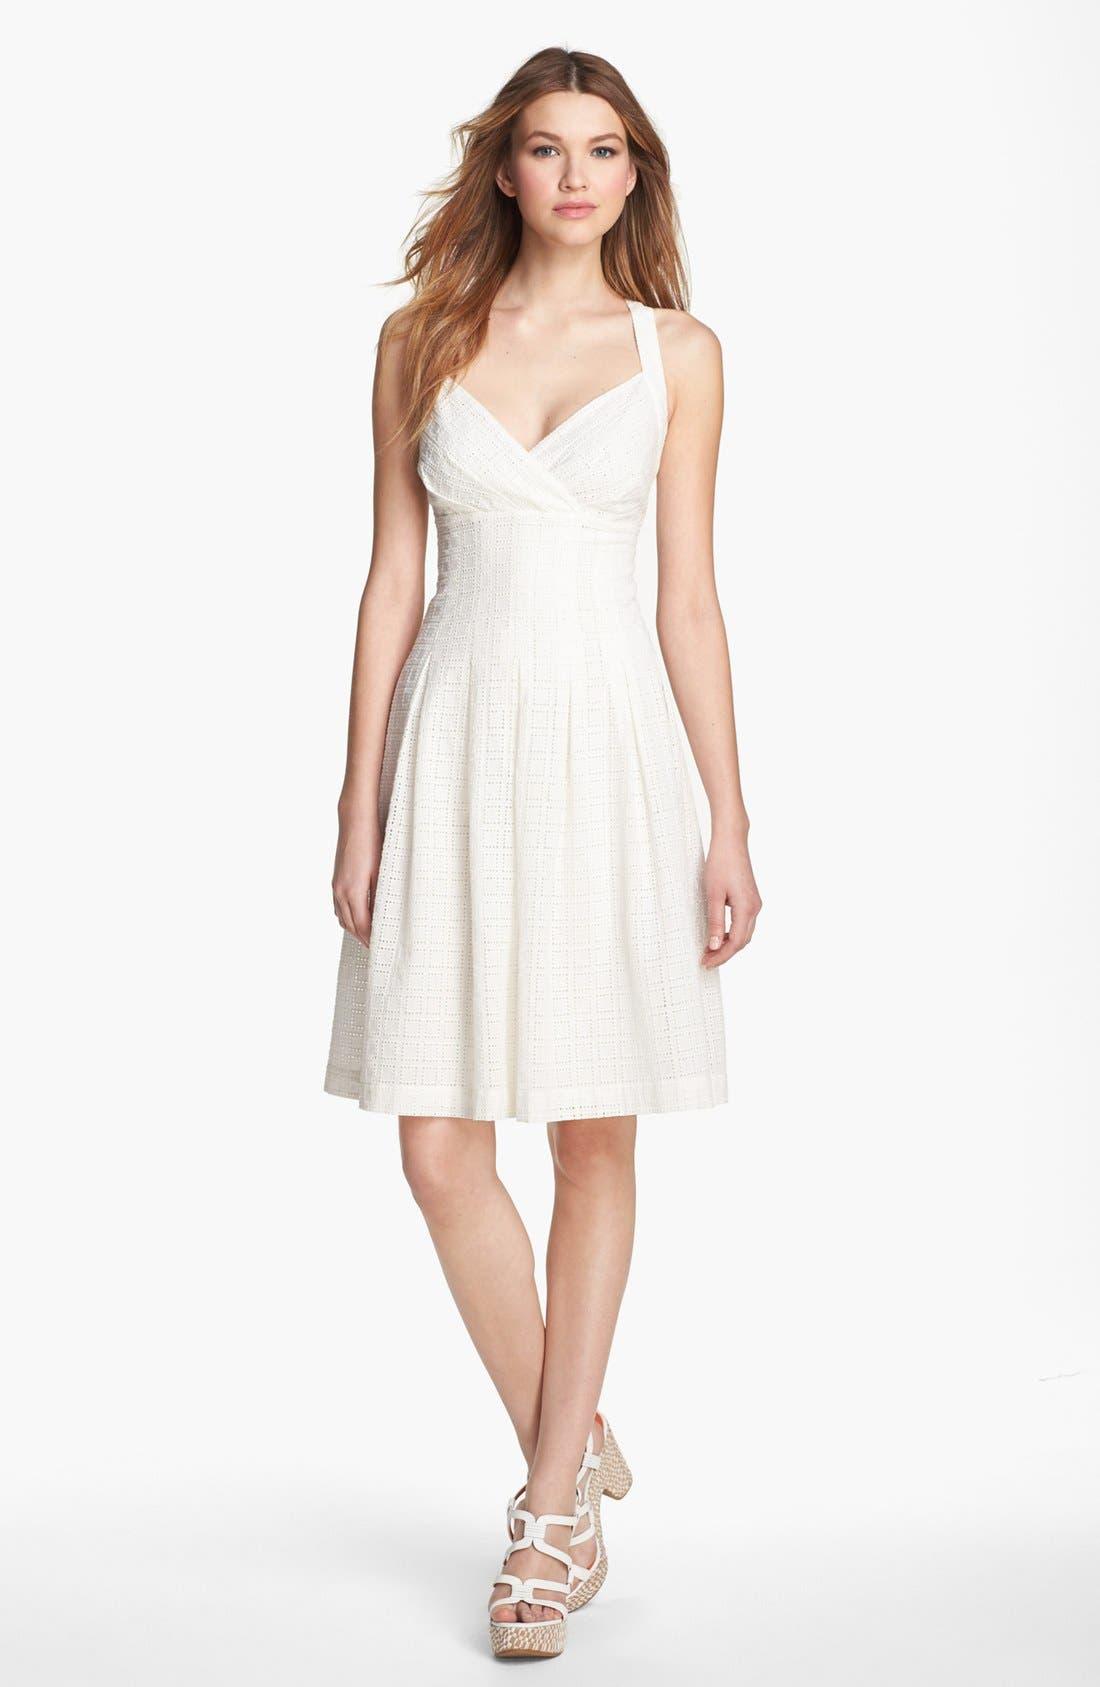 Alternate Image 1 Selected - Calvin Klein Eyelet Fit & Flare Dress